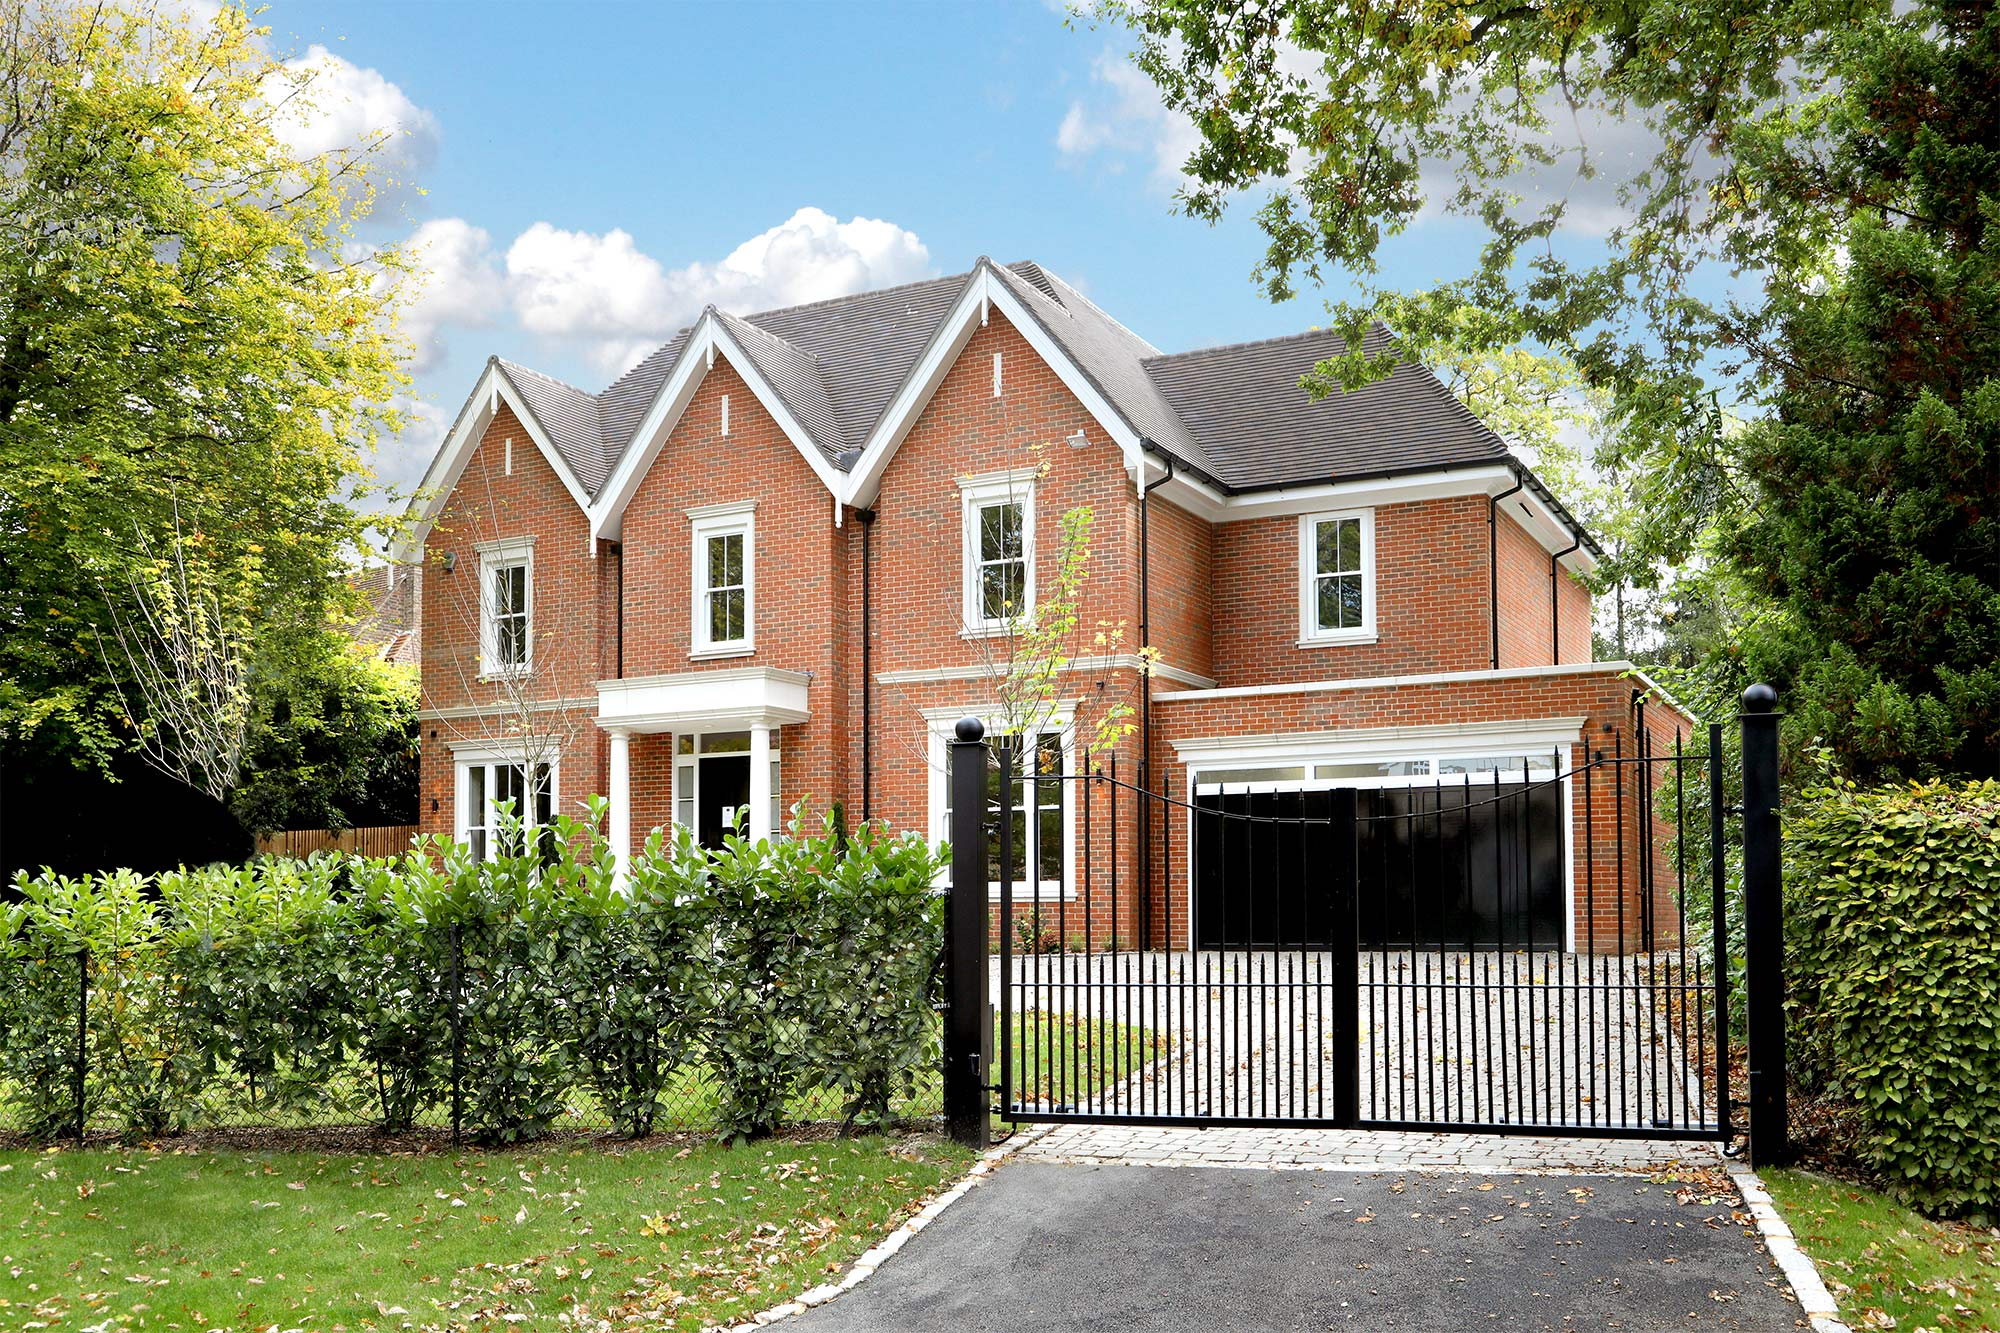 good octagon homes #4: Brockstone Kingswood, Surrey